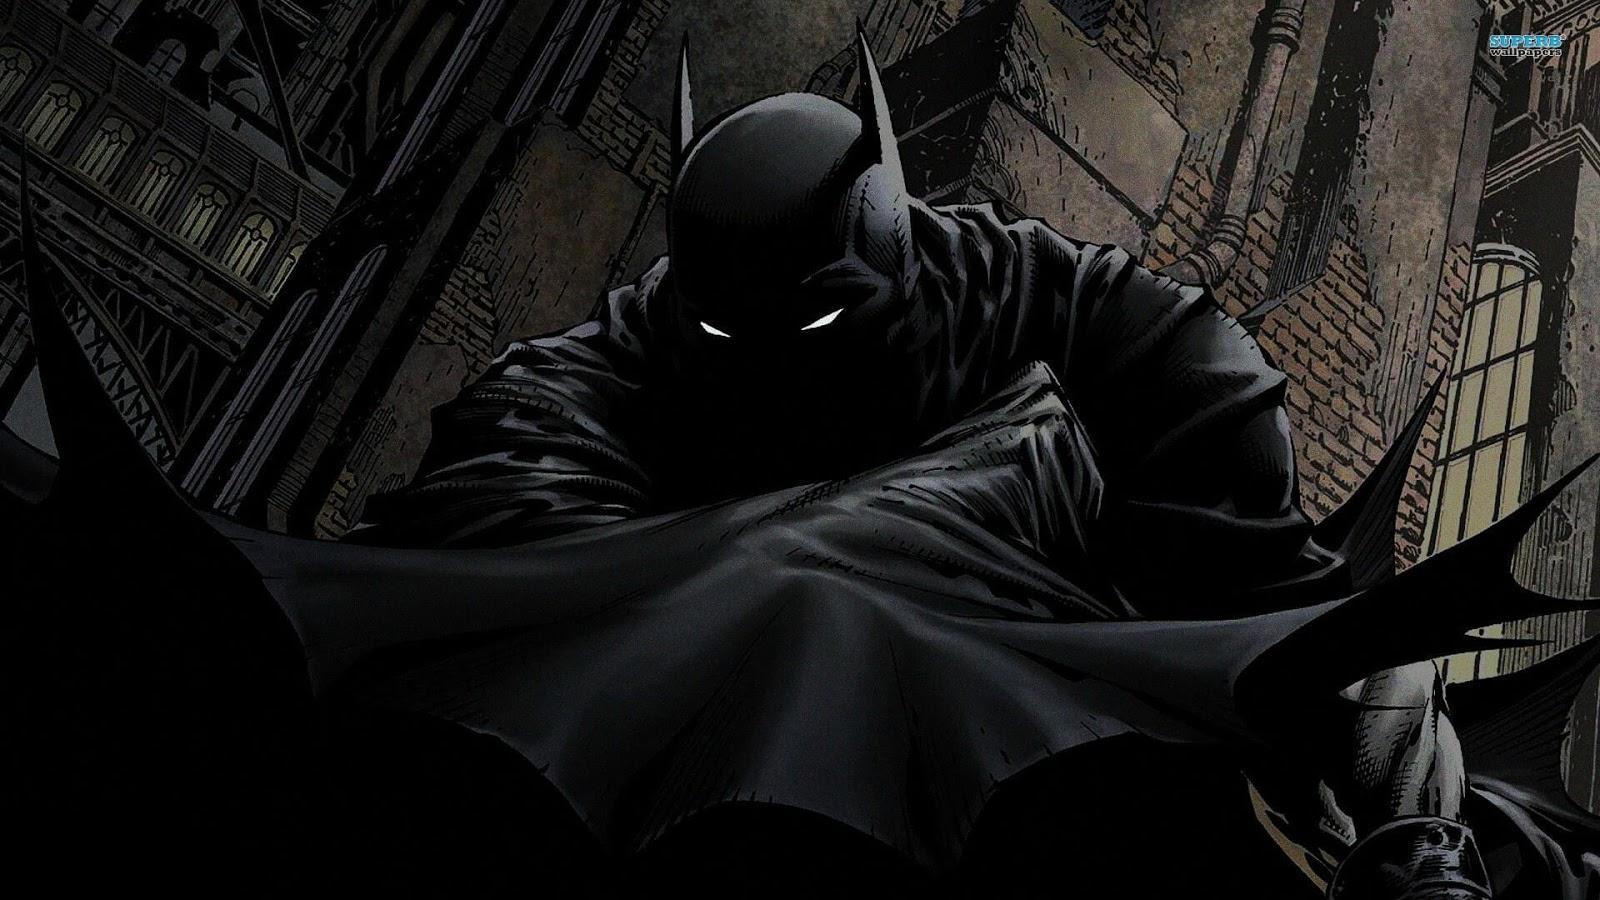 Ultra HD 4K Batman Wallpaper Download - Free New ...